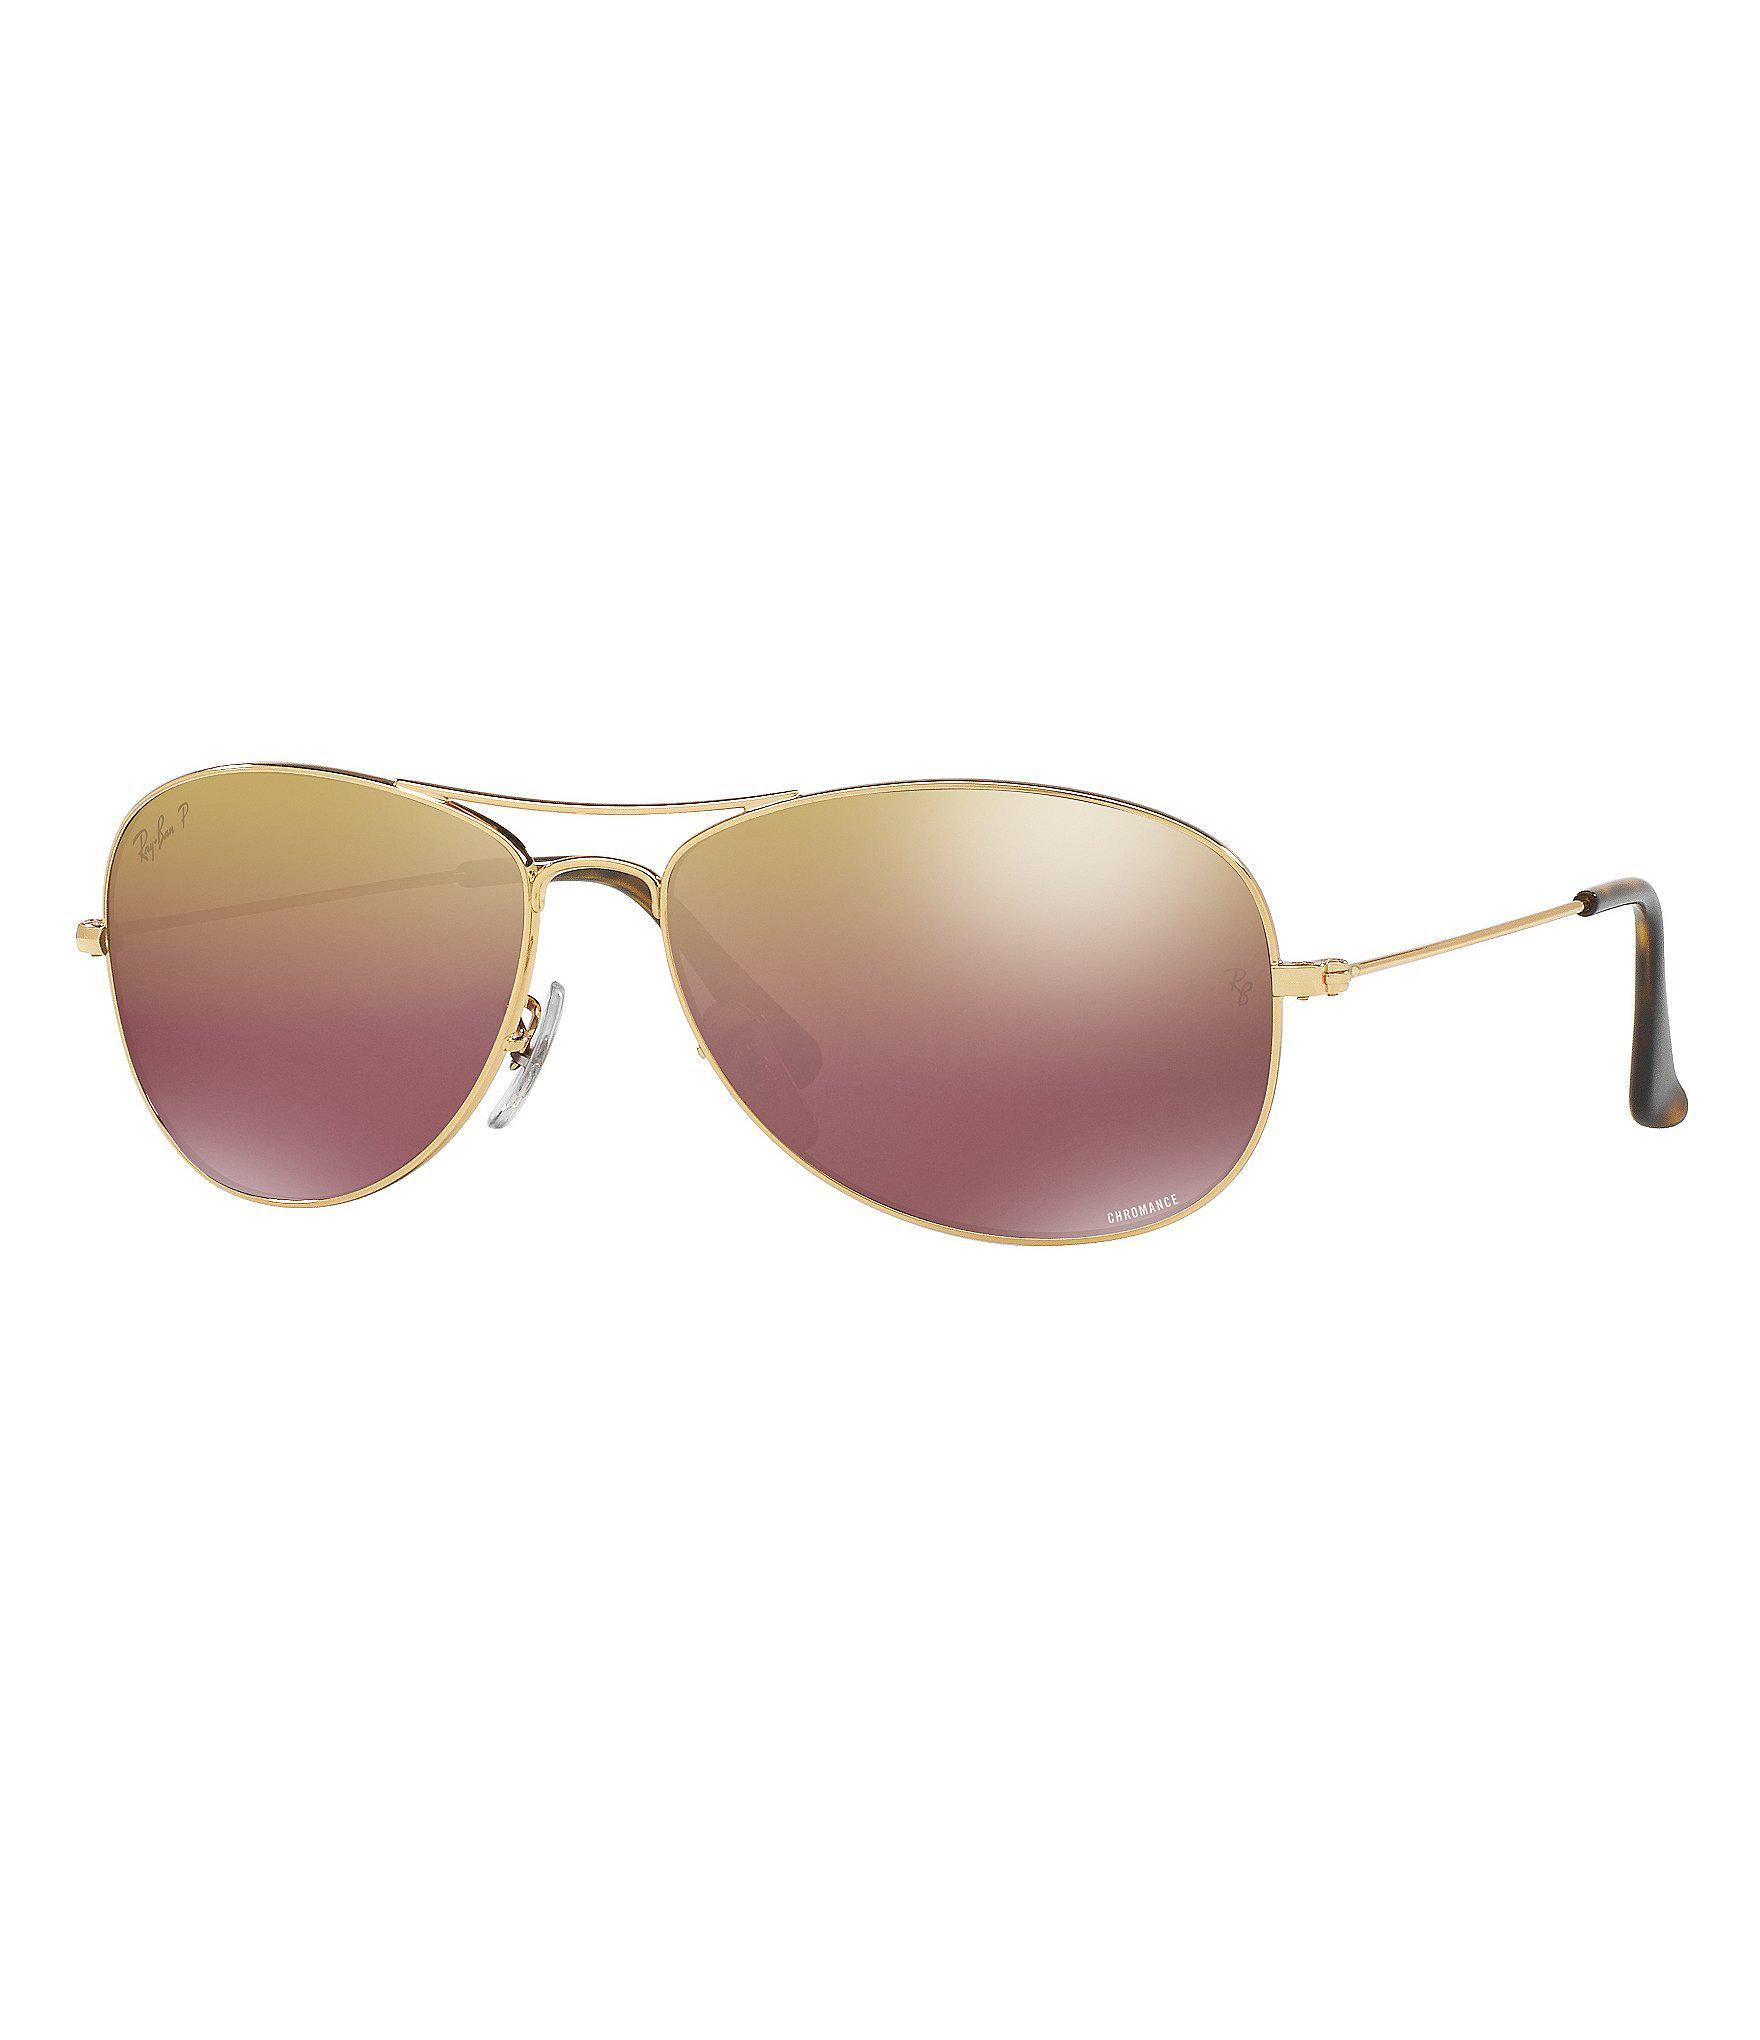 806c23aa46b Ray-Ban. Men s Metallic Chromance Polarized Mirrored Aviator Sunglasses